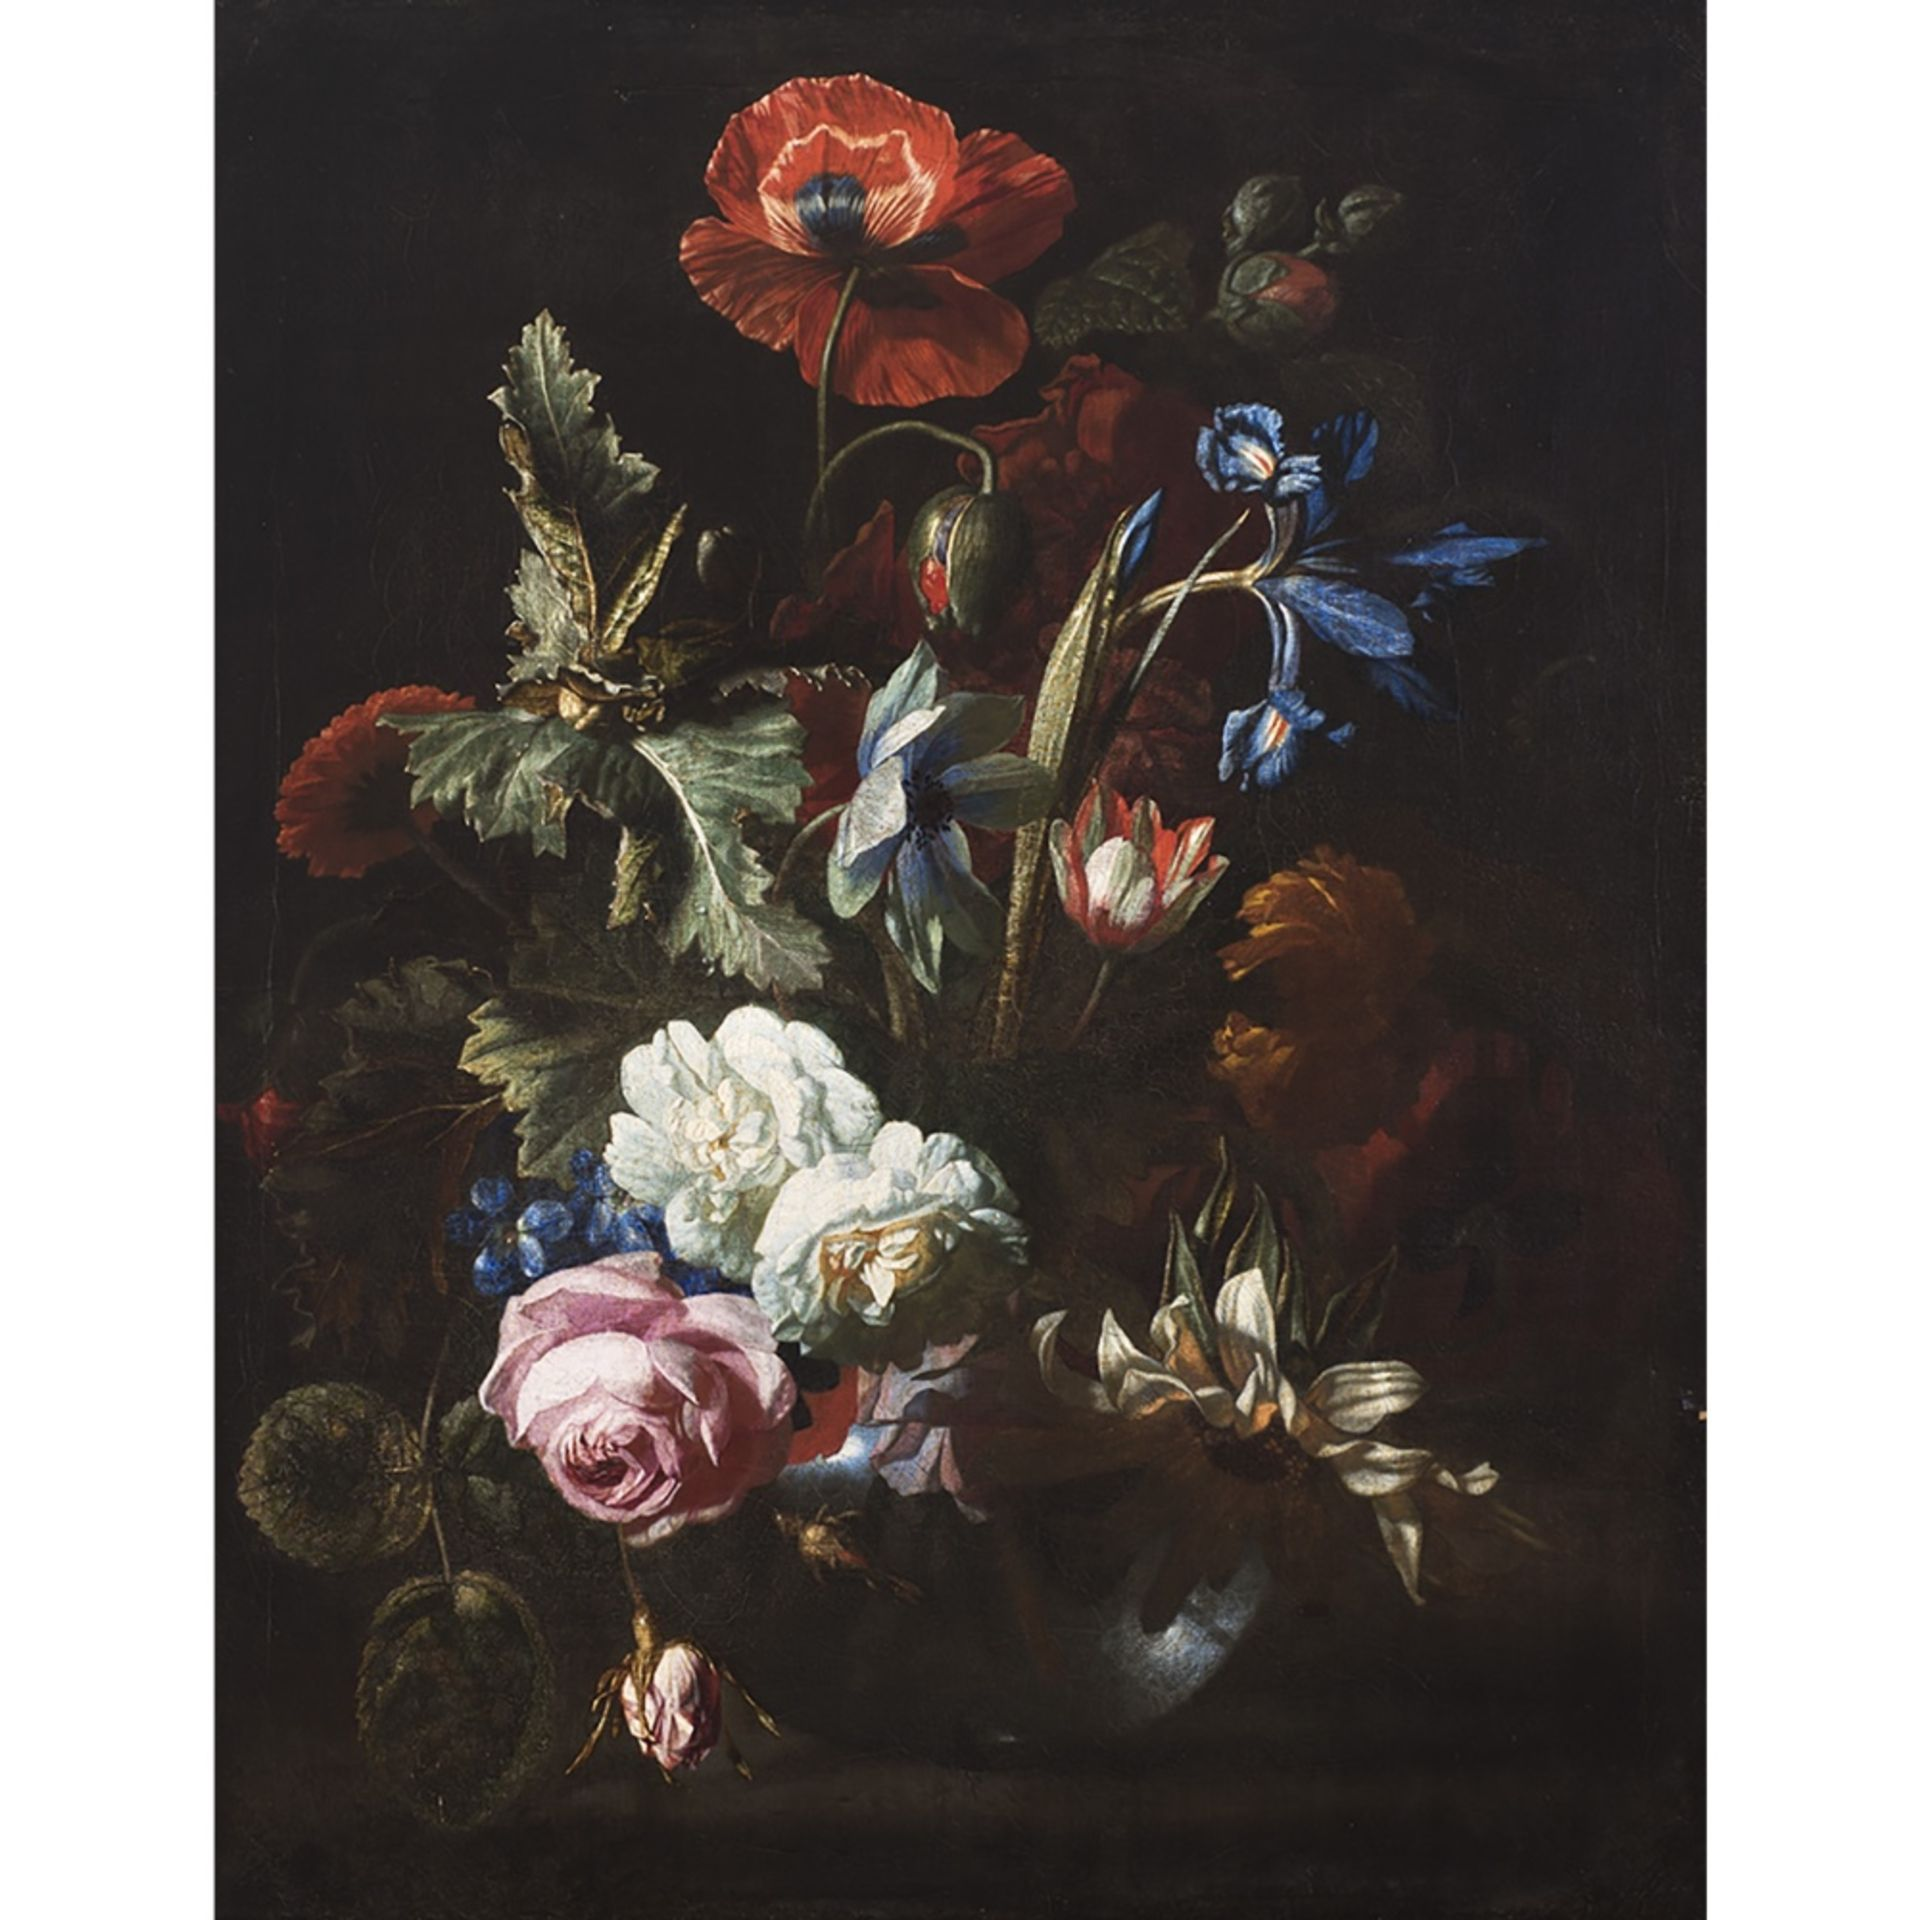 SIMON PETER VERELST (La Haye 1644-Londres 1721)